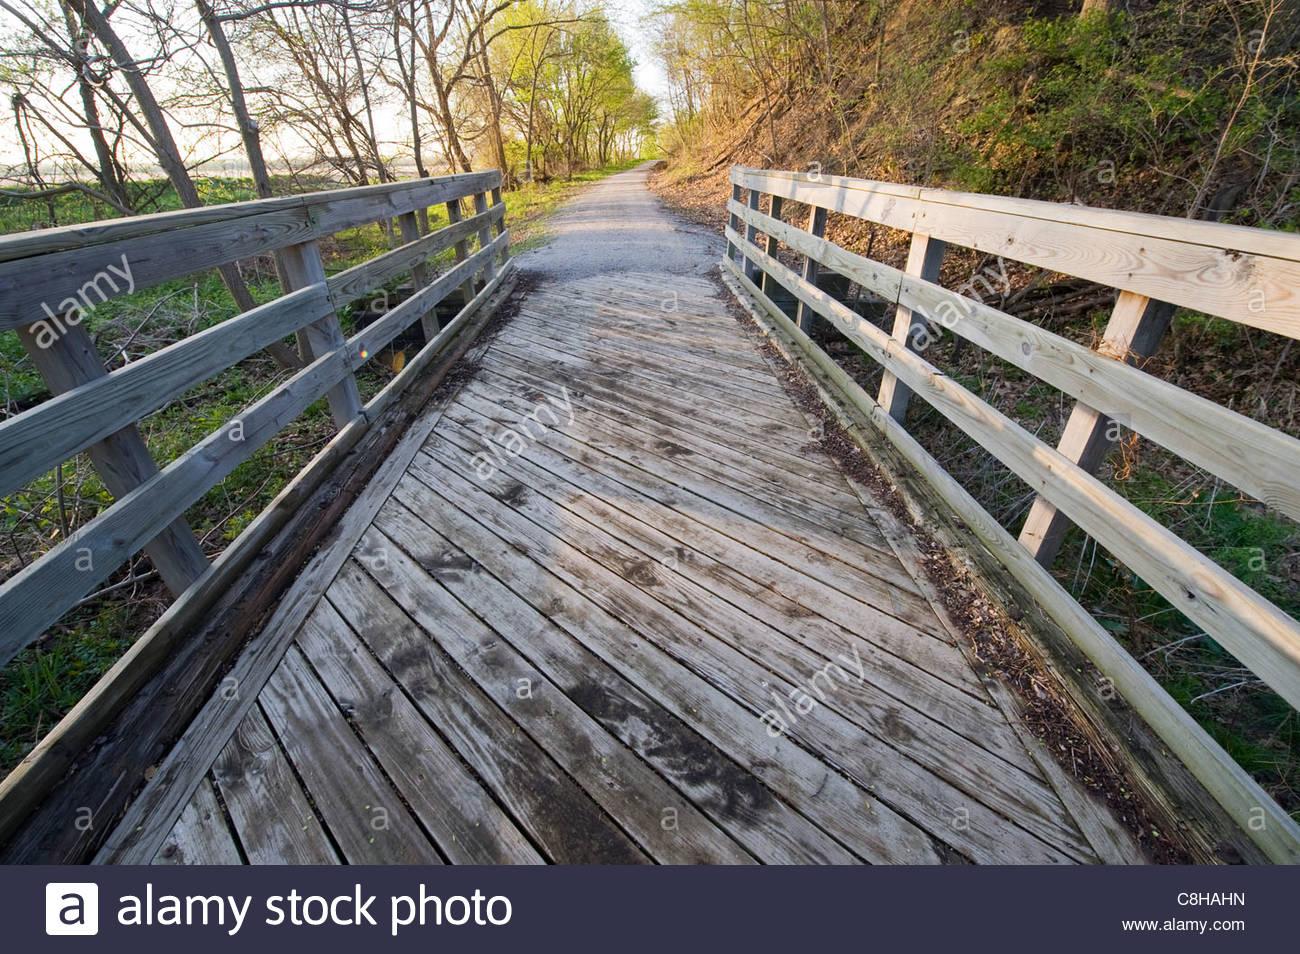 The start of the Steamboat Trace trail near Nebraska City, NE. - Stock Image